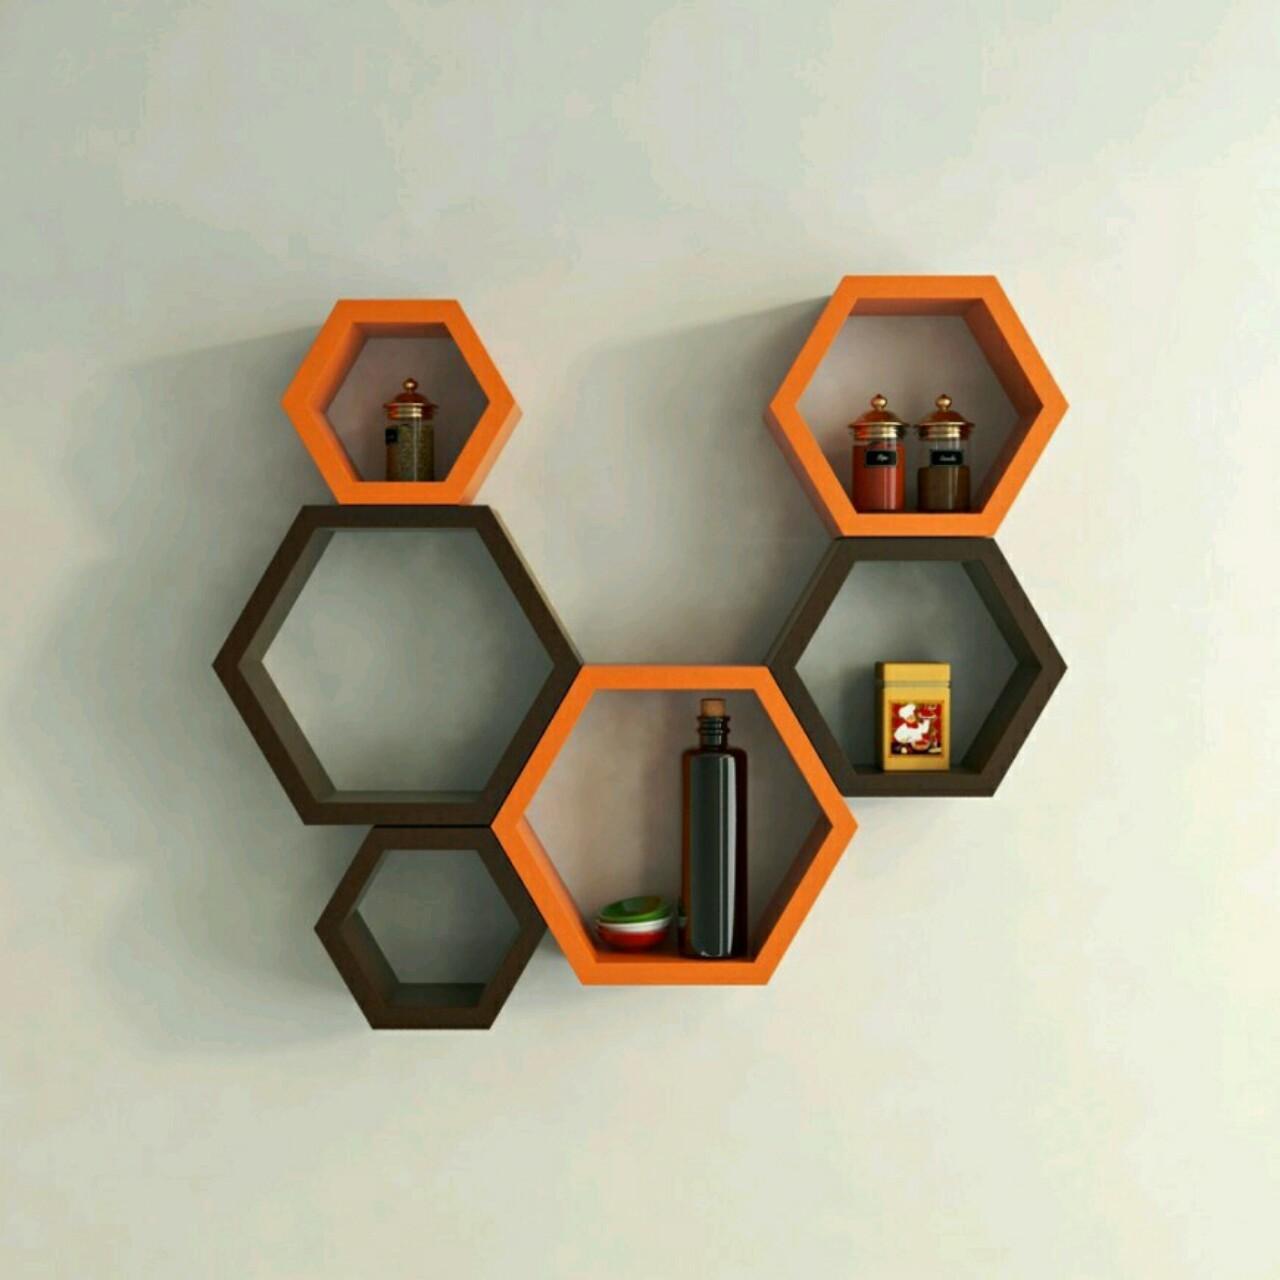 View huzain handicrafts multi color wall shelf Wooden Wall Shelf(Number of Shelves - 6, Brown, Orange) Furniture (huzain handicrafts)